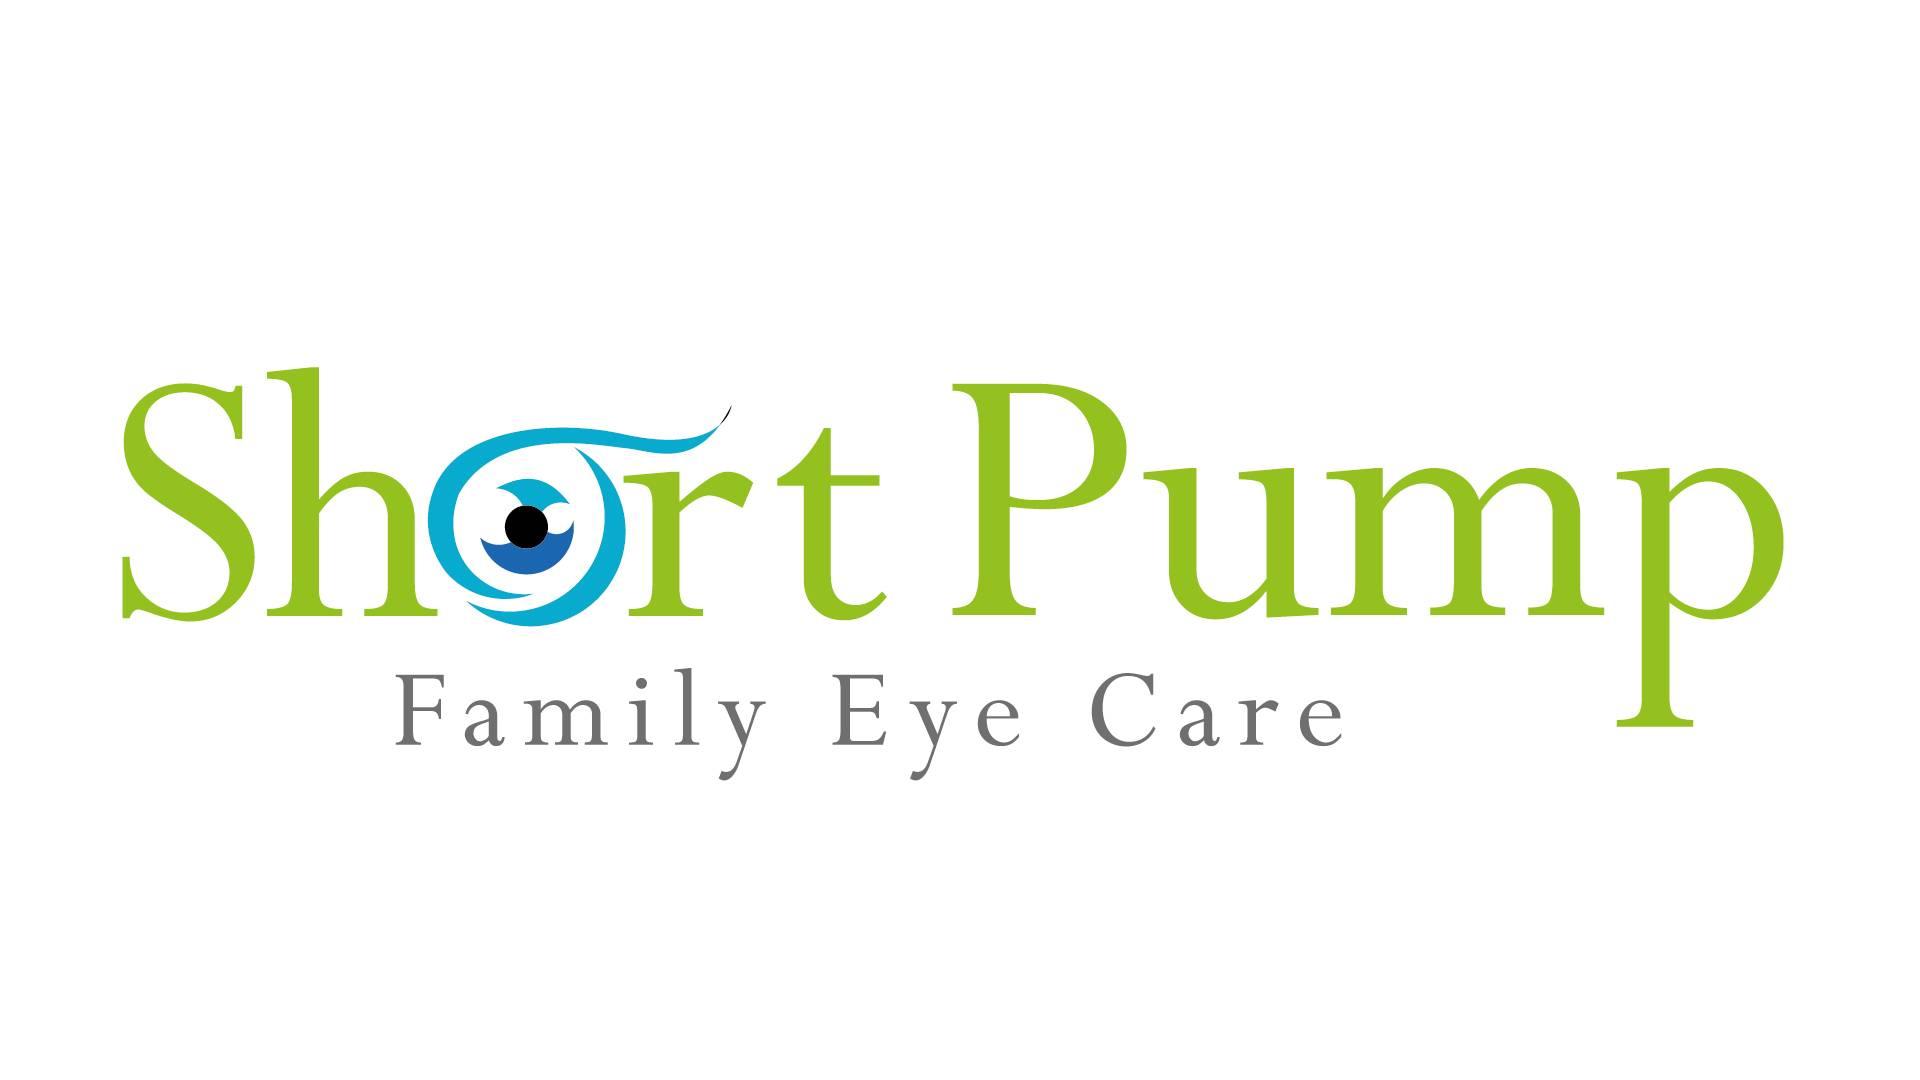 Short Pump Family Eye Care